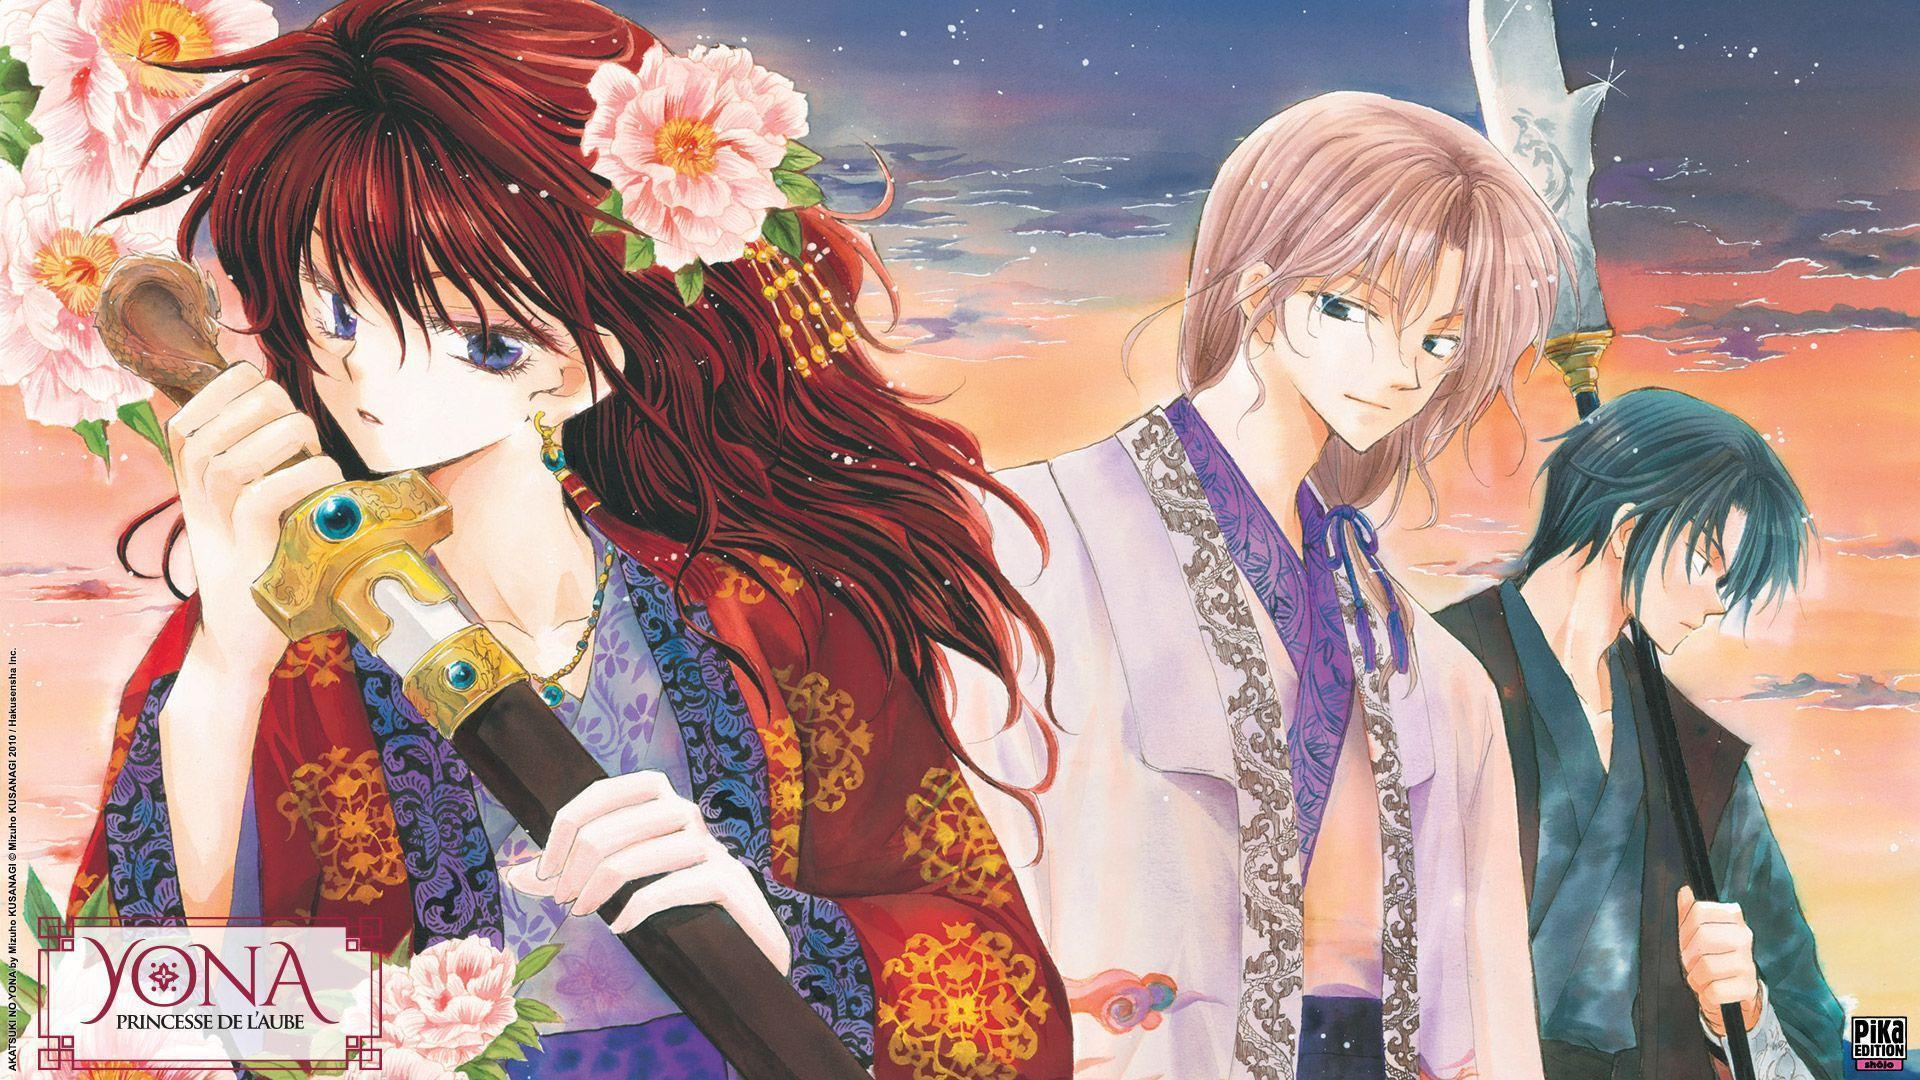 Akatsuki no yona wallpapers wallpaper cave - Wallpaper anime hd untuk pc ...